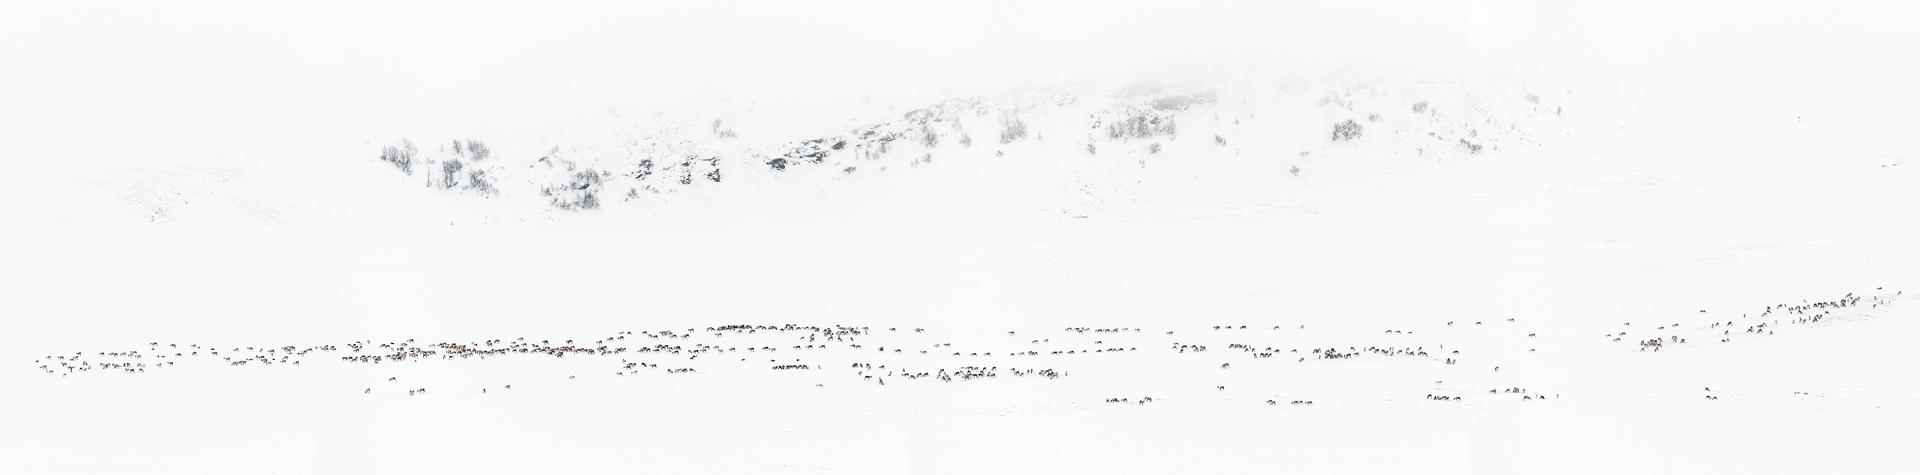 Panorama with wild reindeer